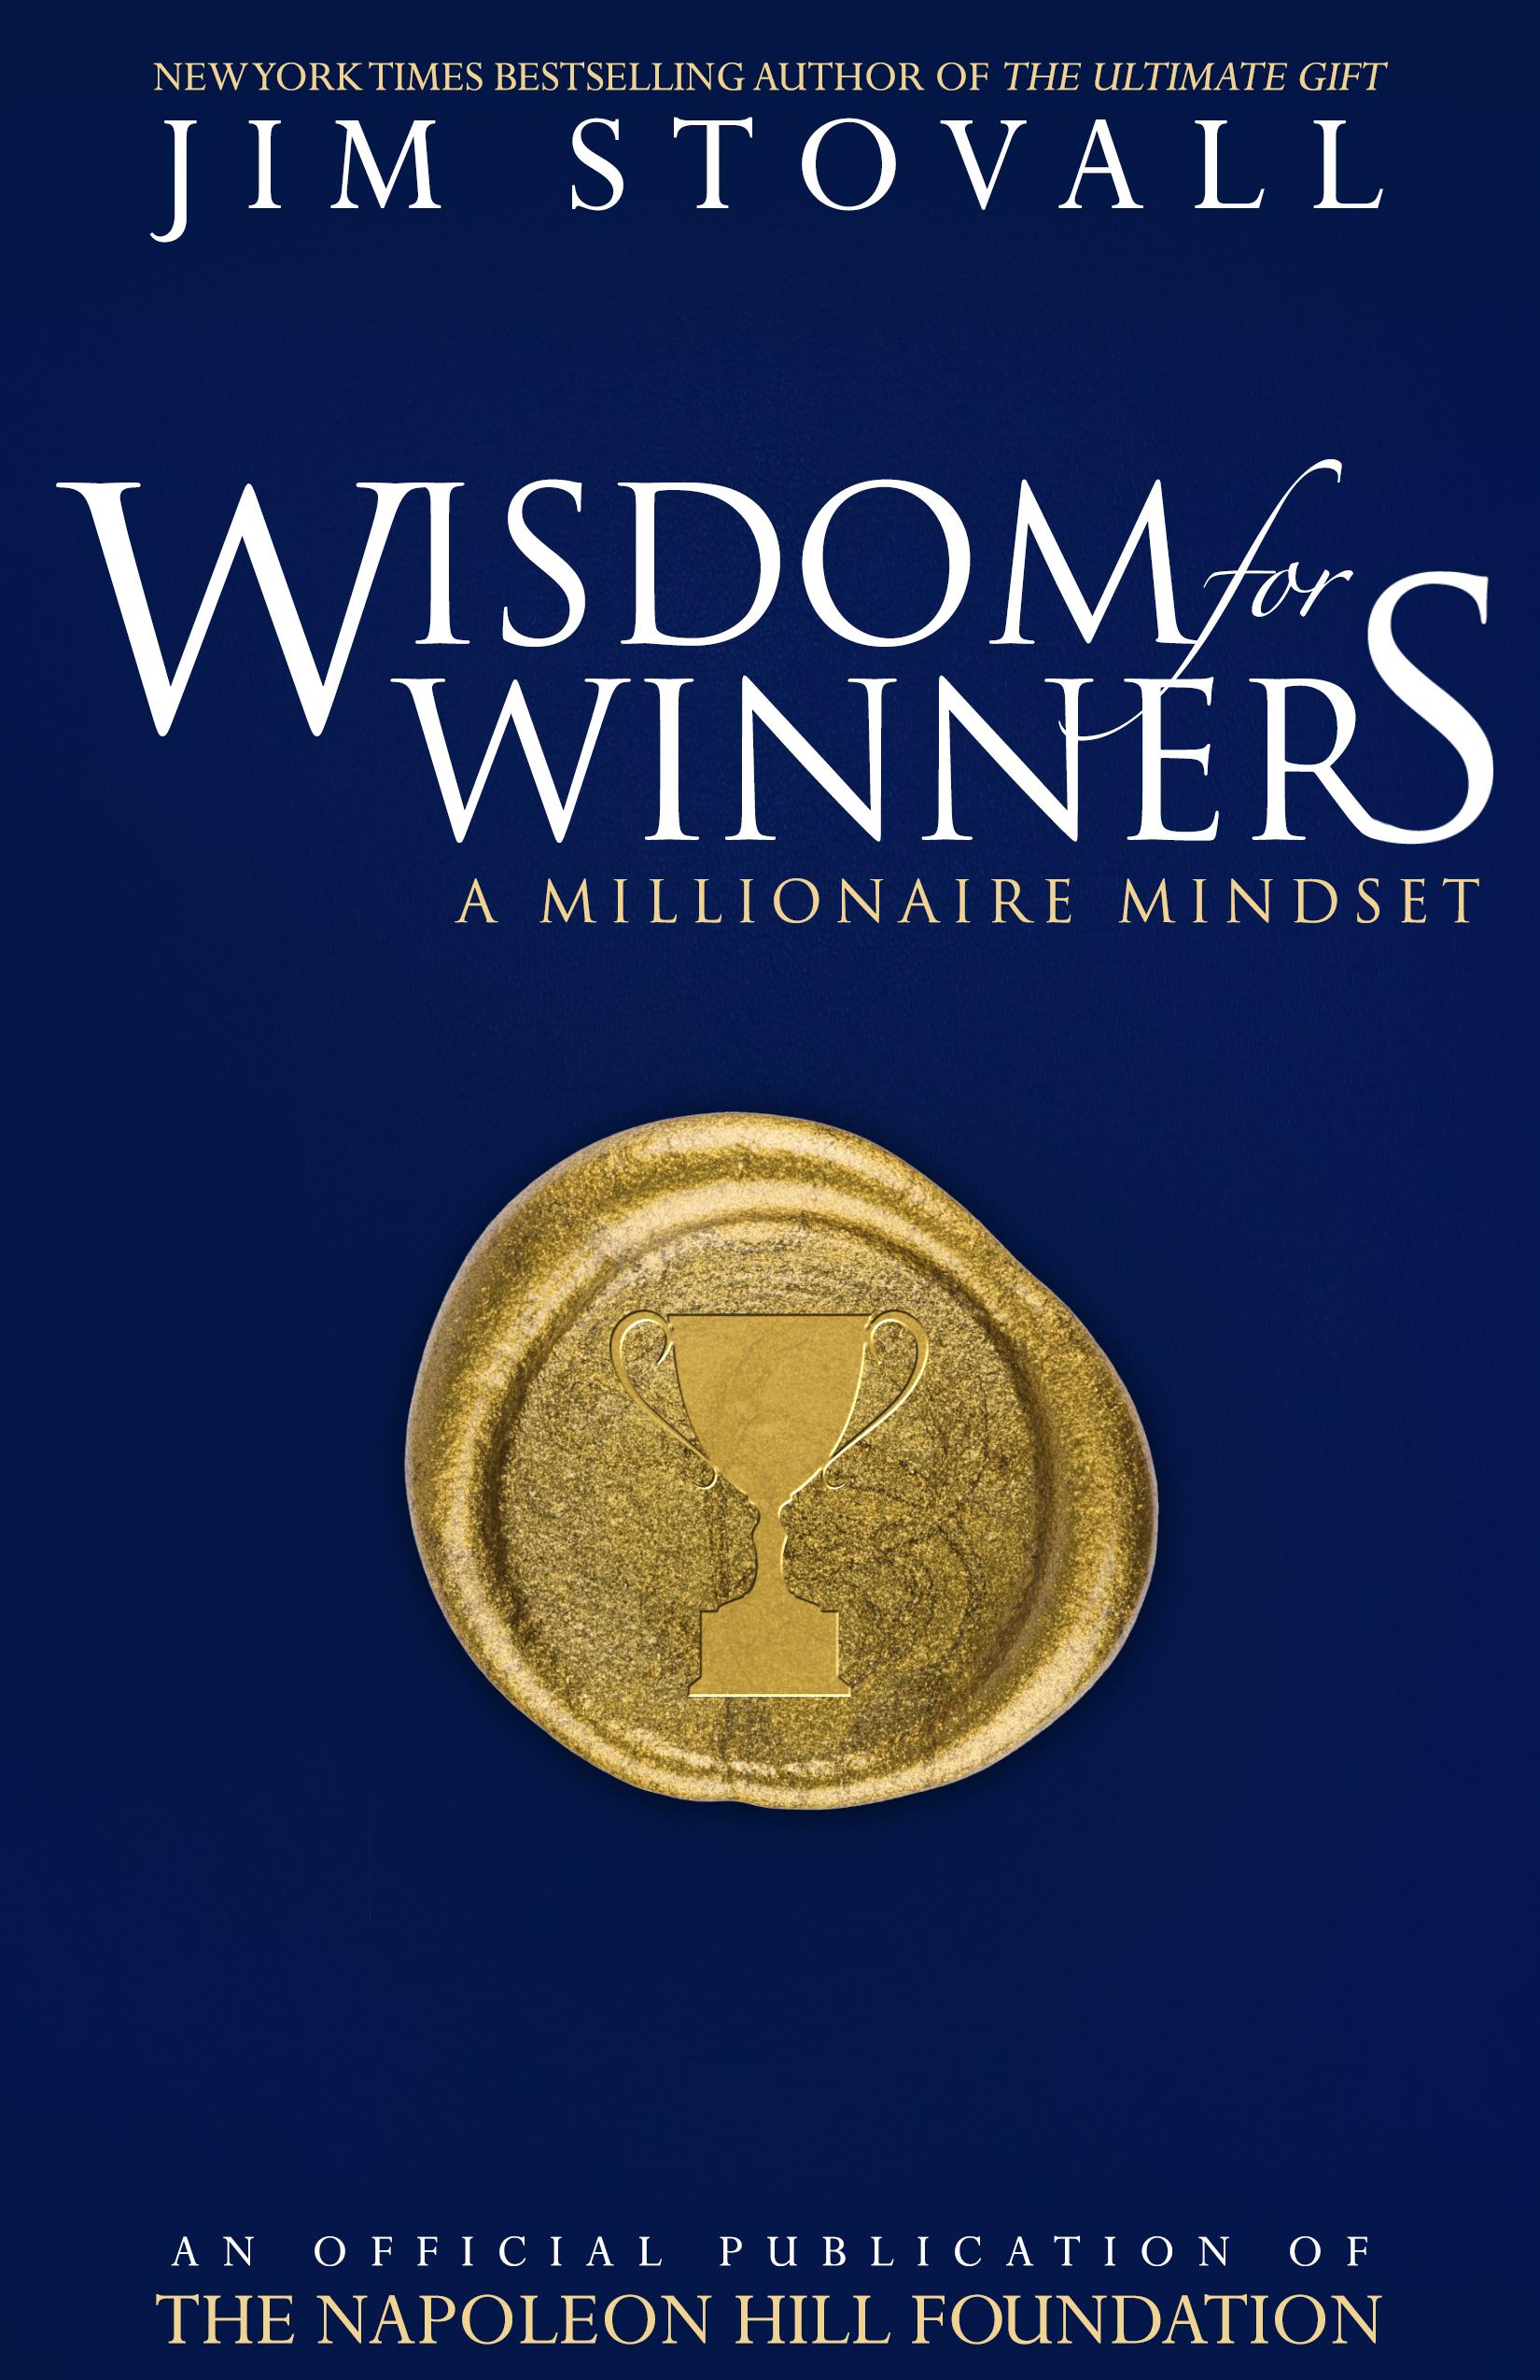 Wisdom for Winners - Jim Stovall